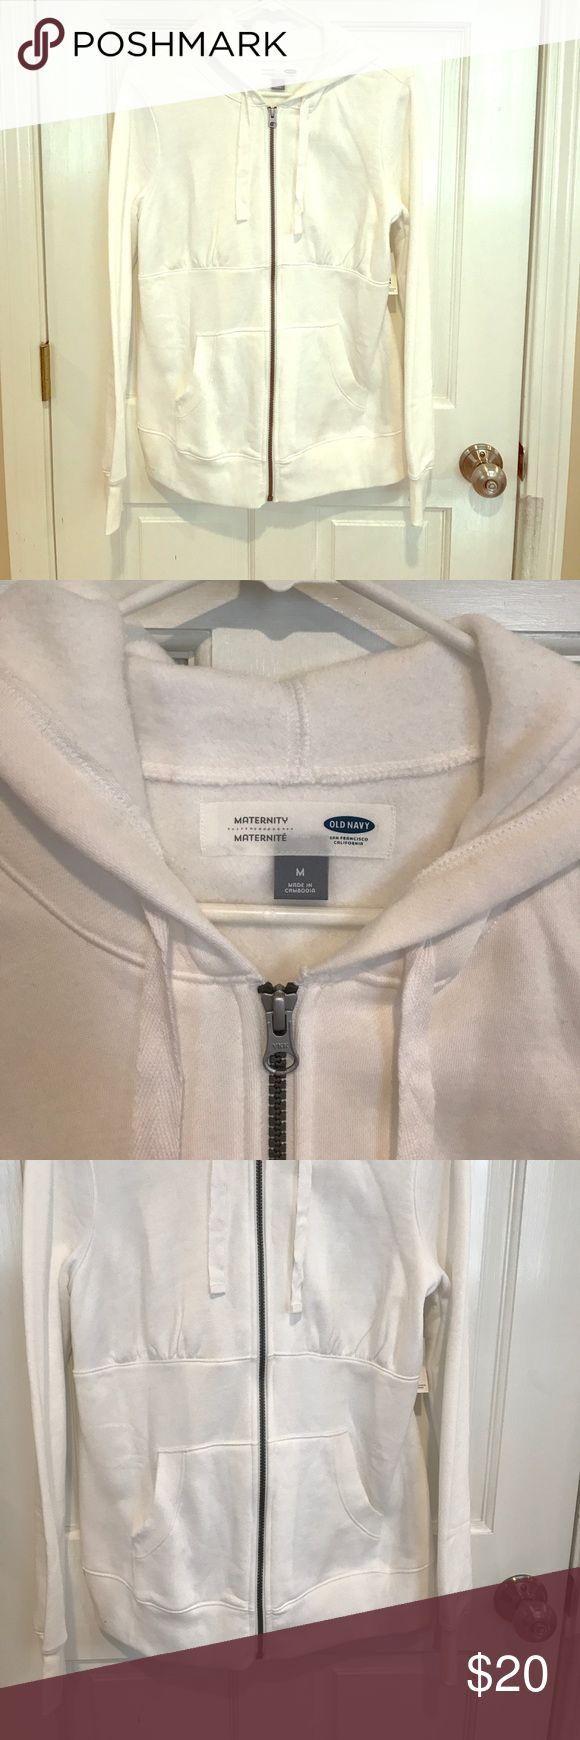 NWT Maternity Sweatshirt Brand new maternity zip up sweatshirt Old Navy Tops Sweatshirts & Hoodies